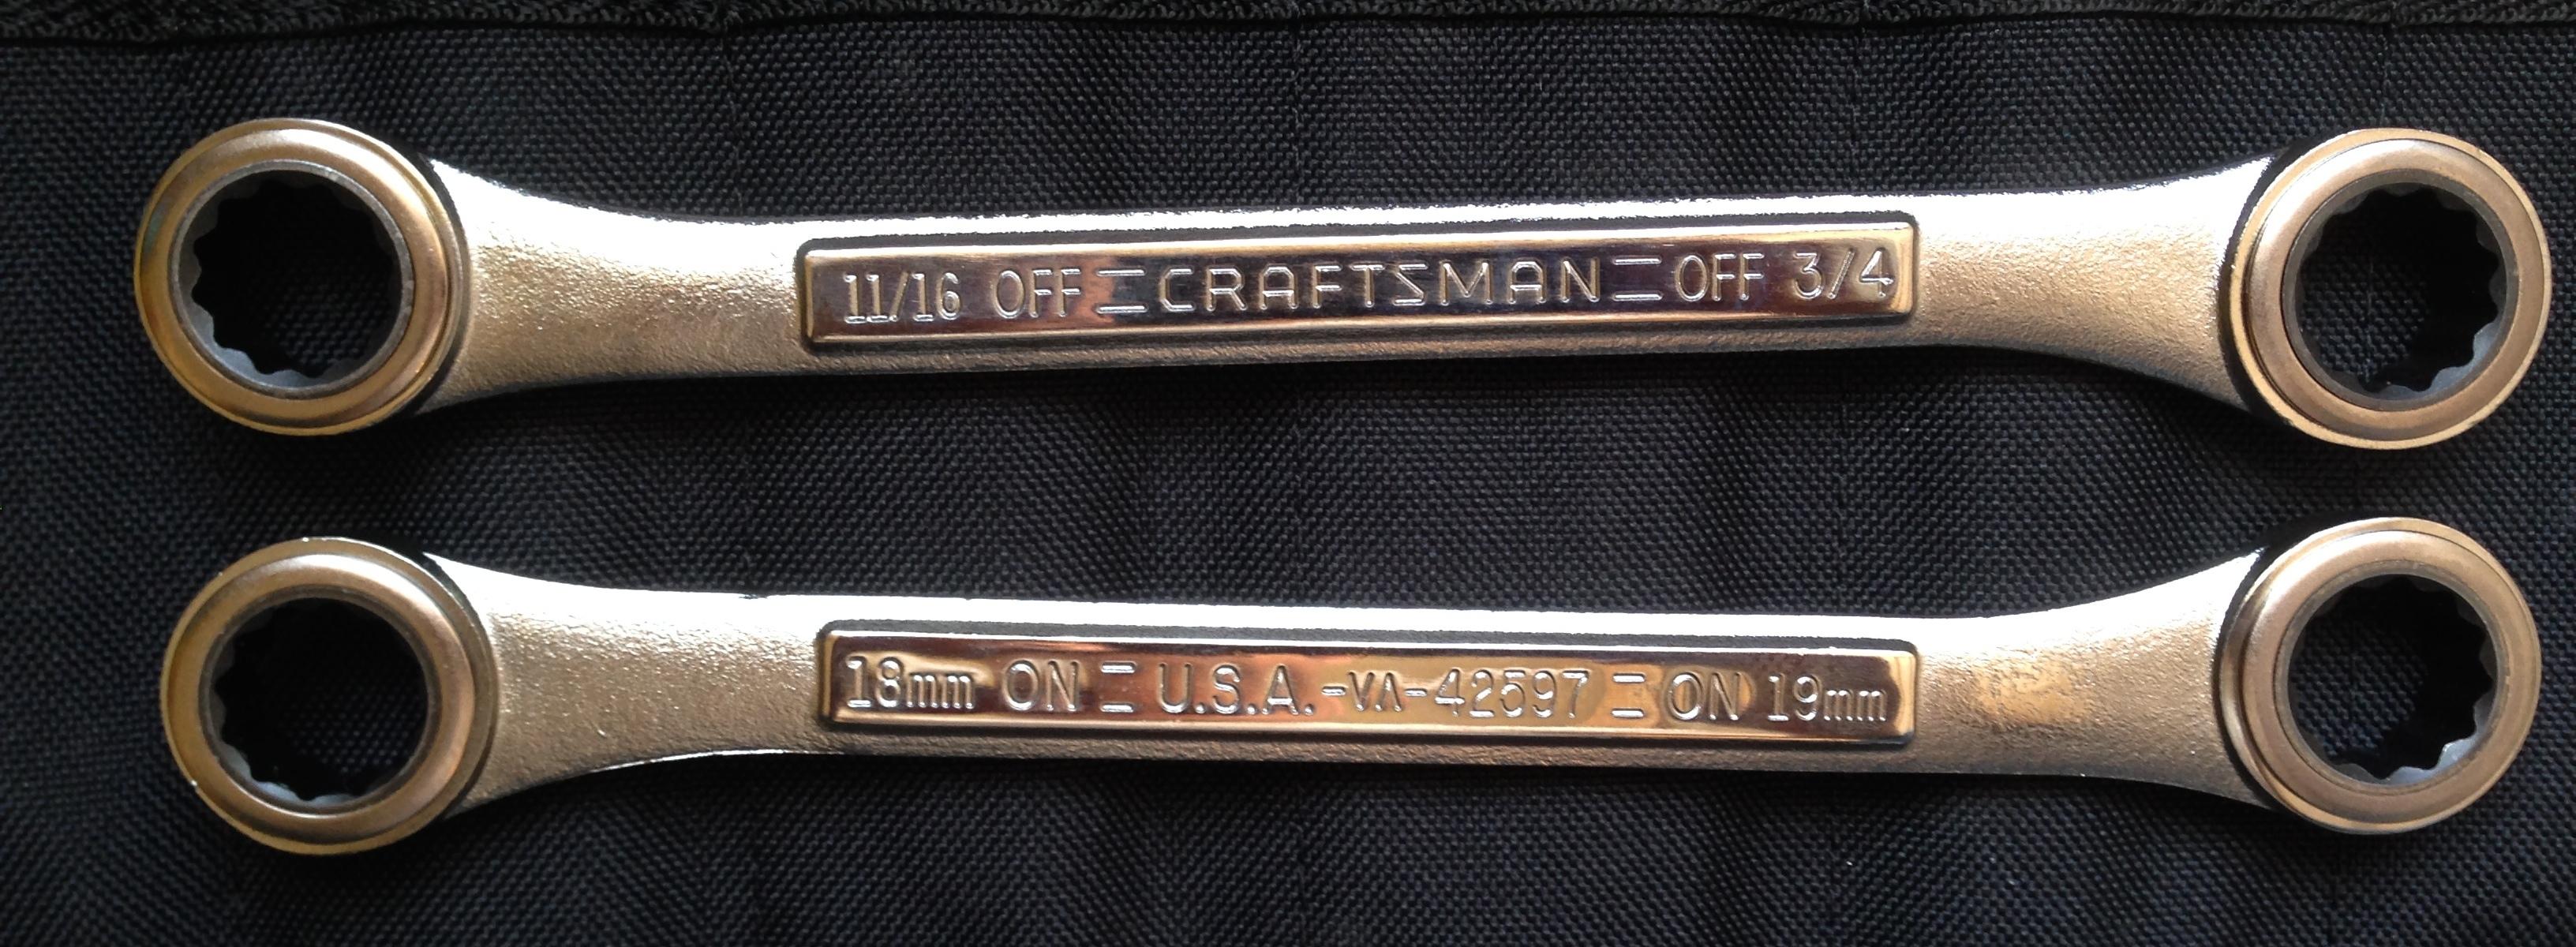 Craftsman ratchet dating